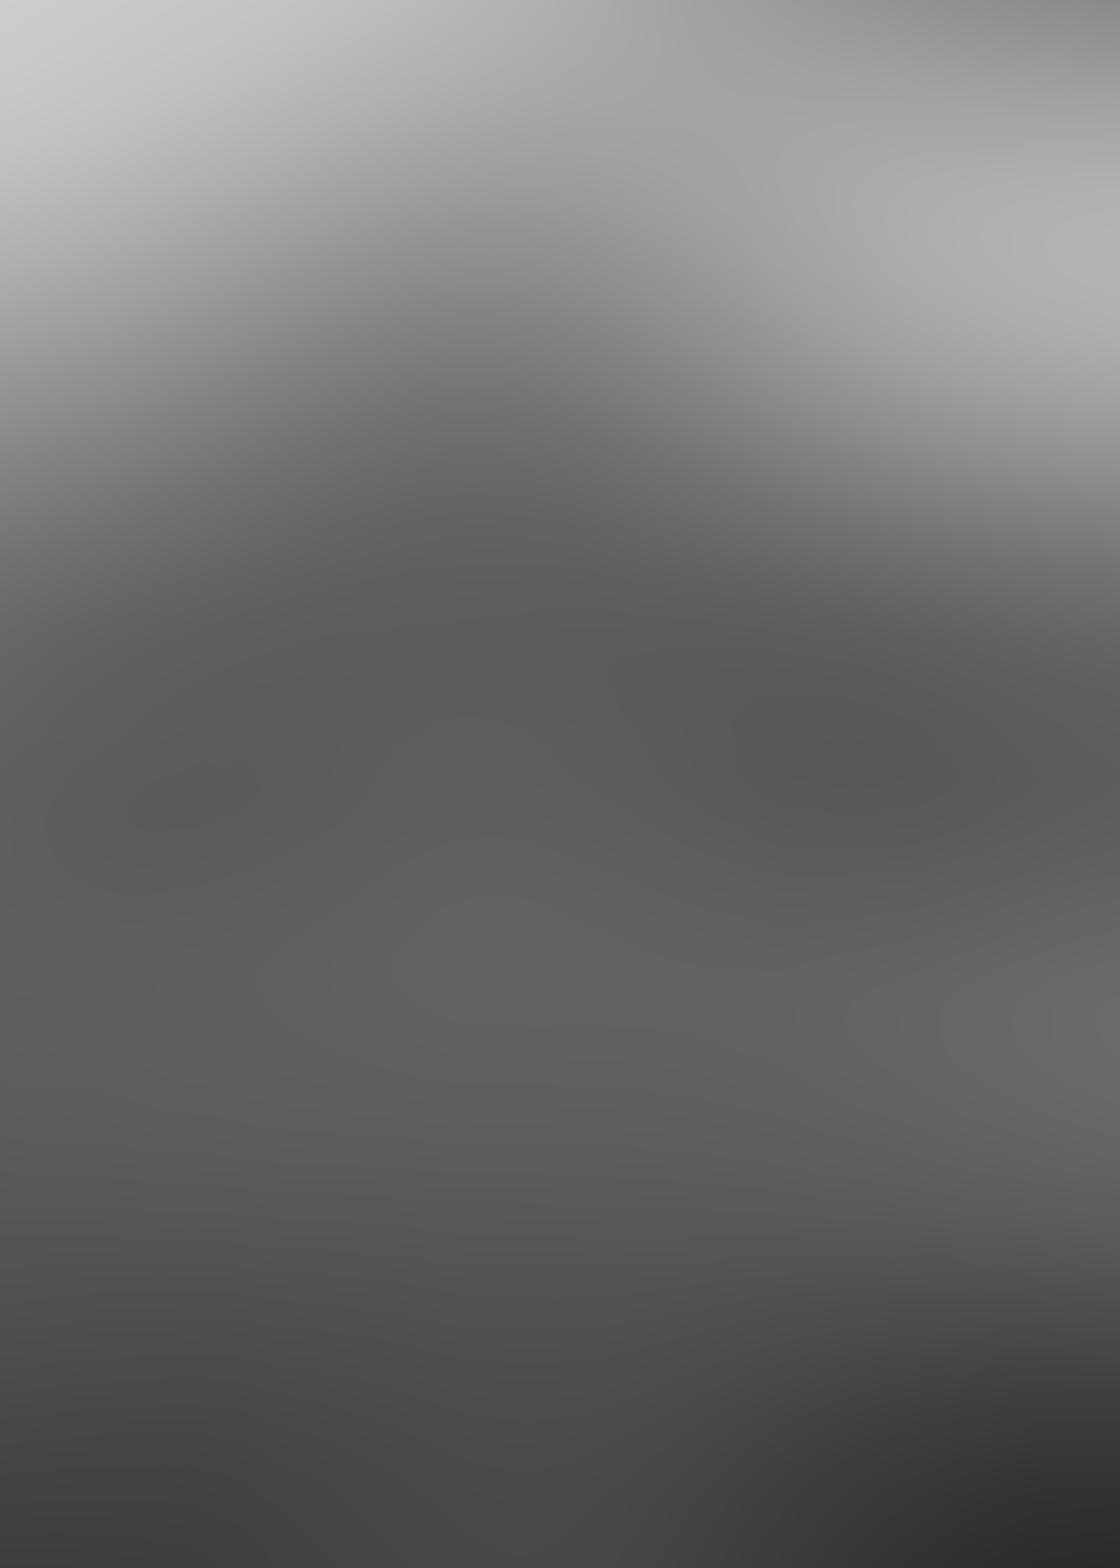 Black & White iPhone Portrait Photos 1